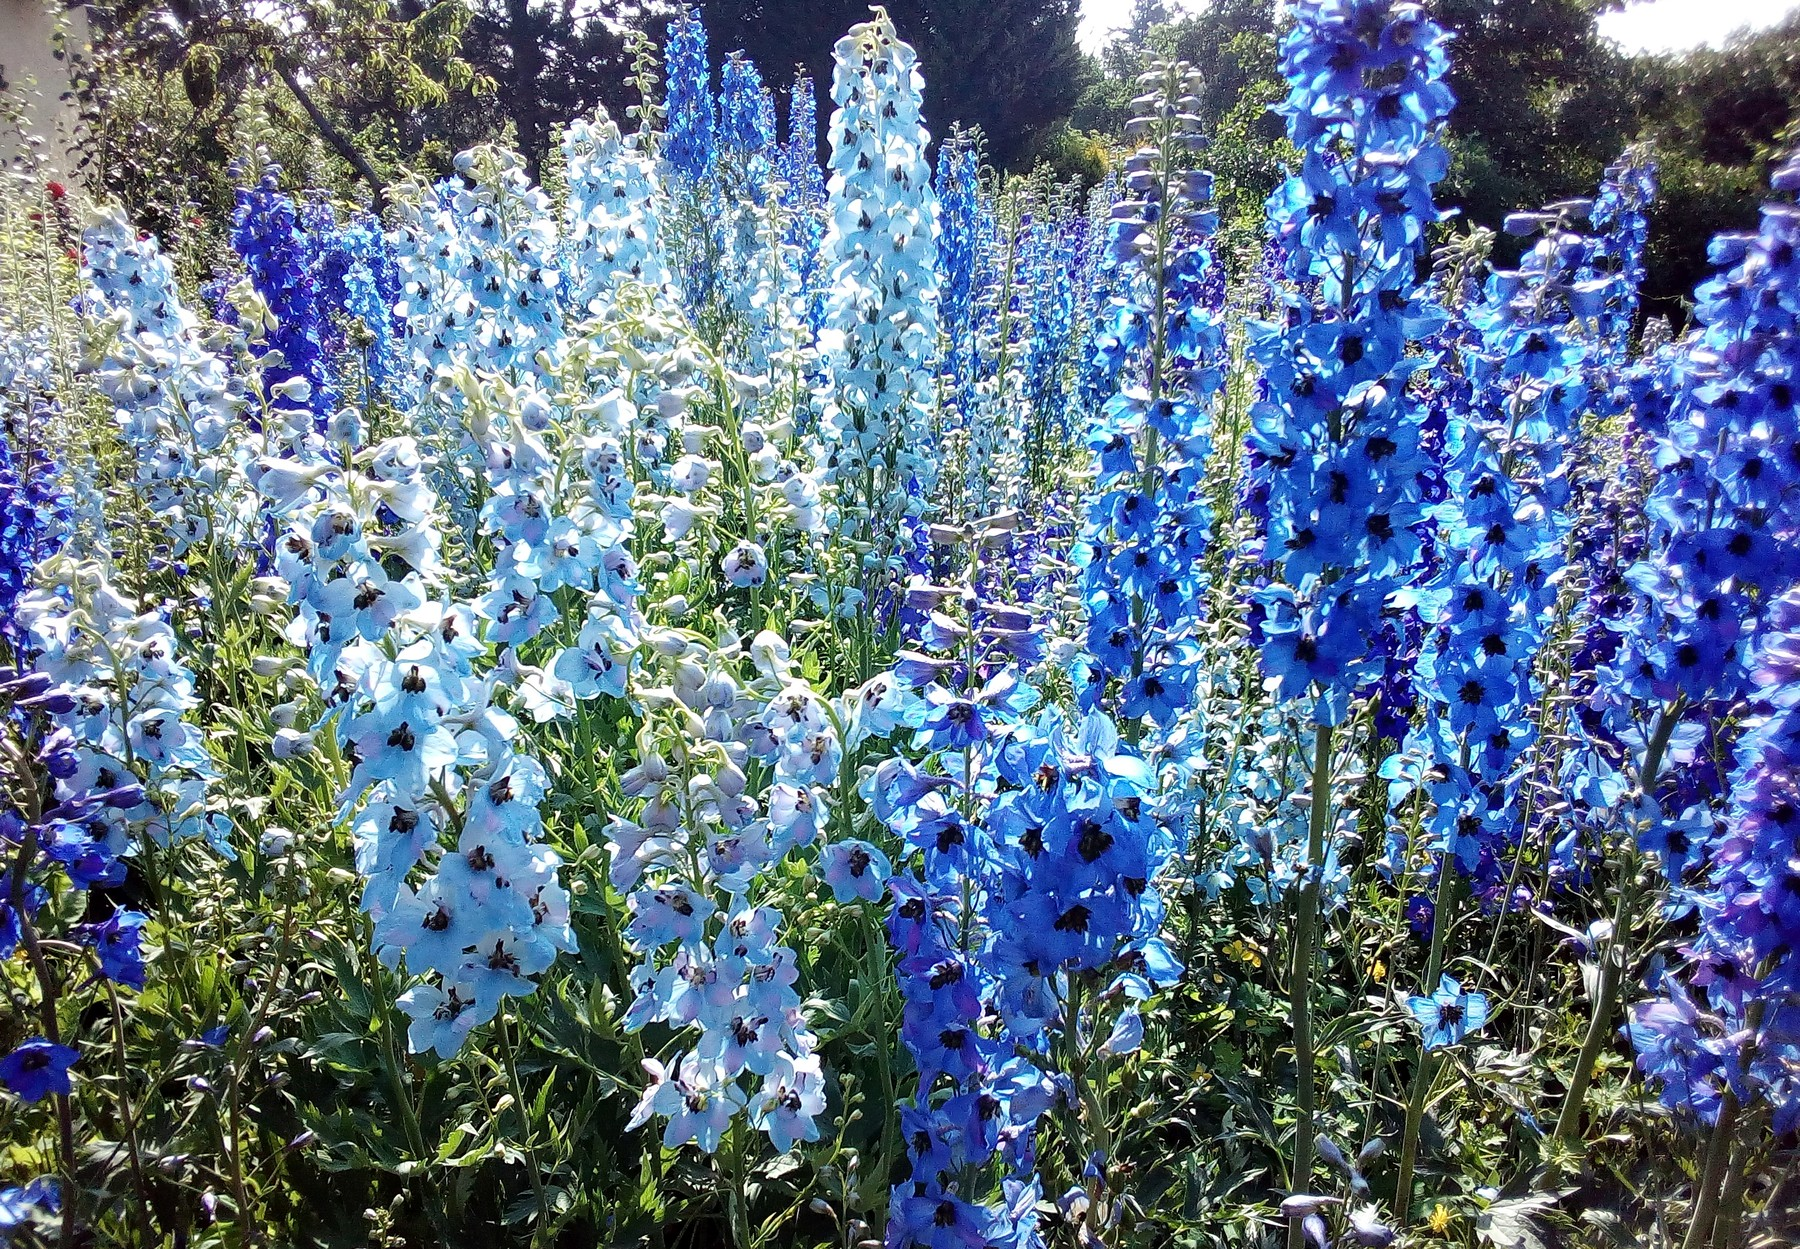 Rittersporn - Delphinium elatum - verschiedene Blautöne